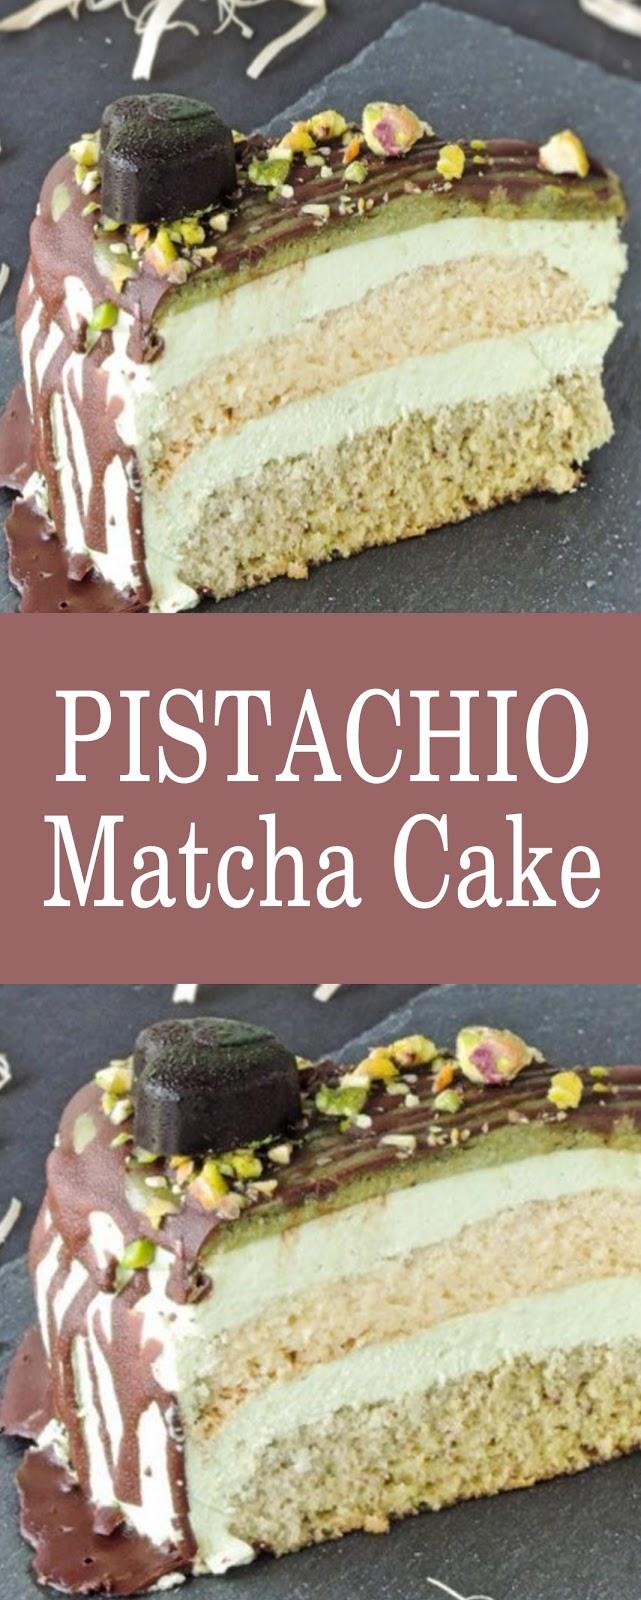 Pistachio Matcha Cake #cakes